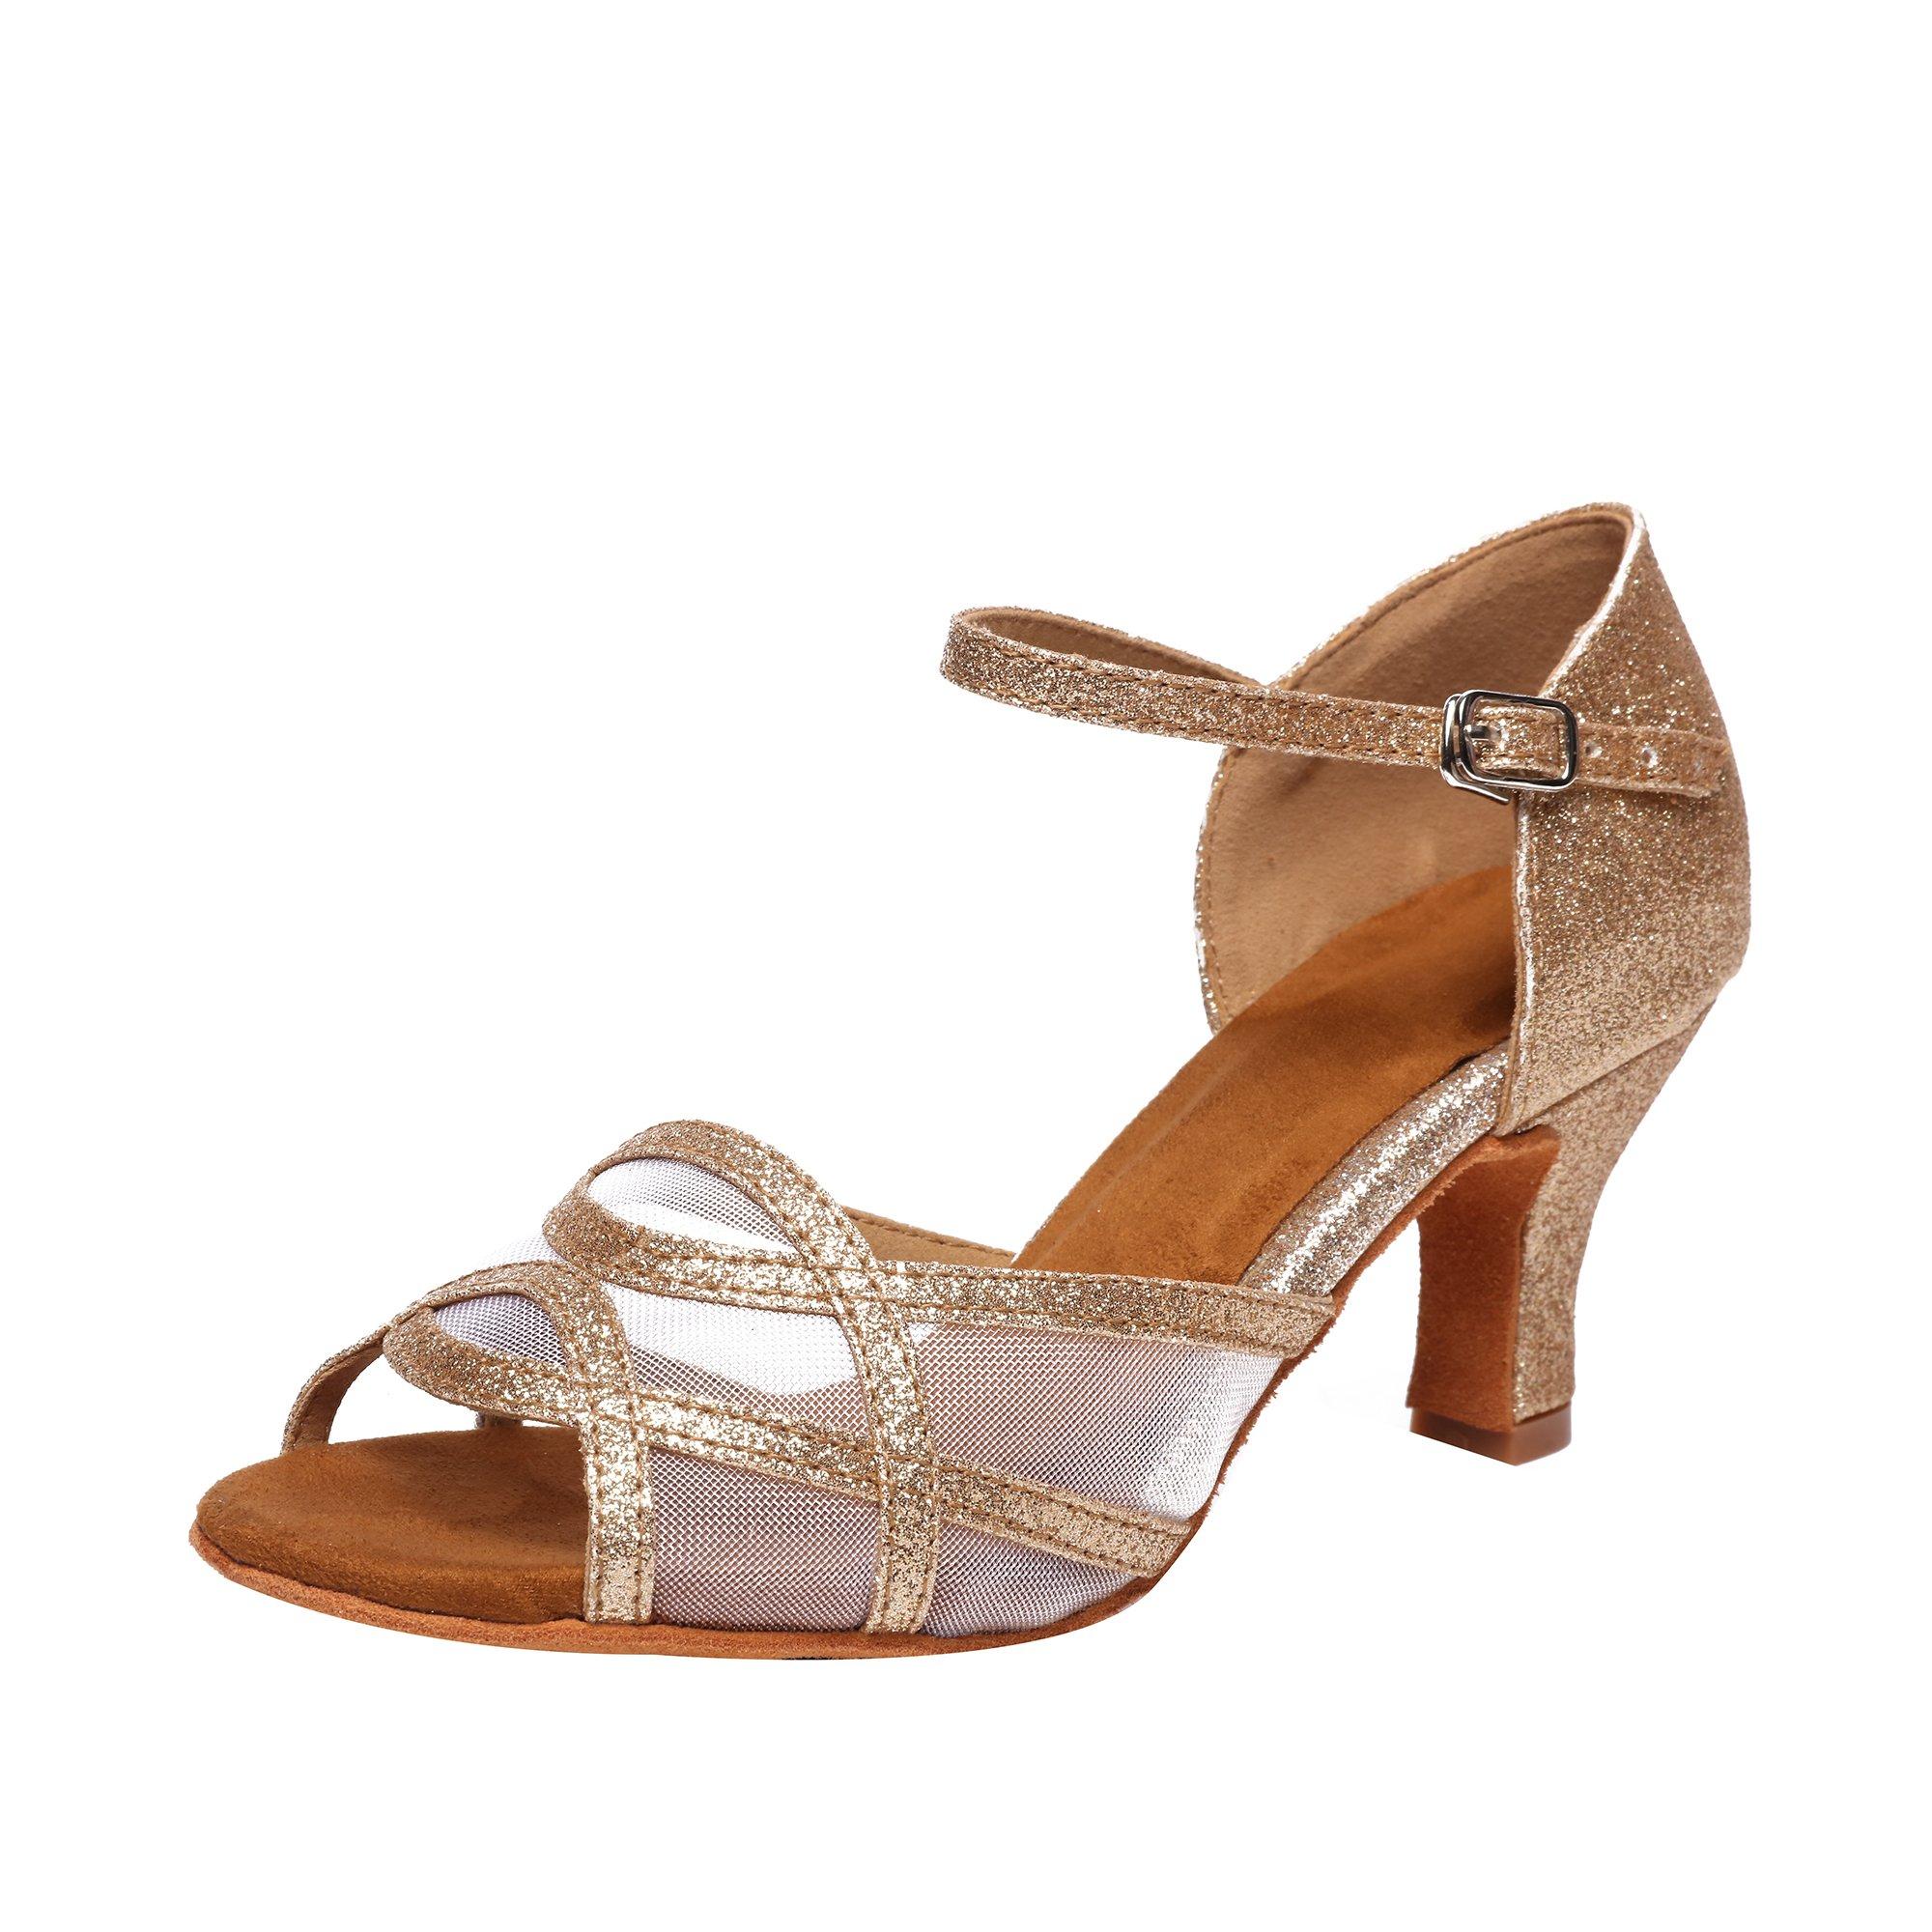 Women's Latin Dance Shoes Female's Ballroom Salsa Dance Shoes(B-Style Gold Size 7.5) by Akanu